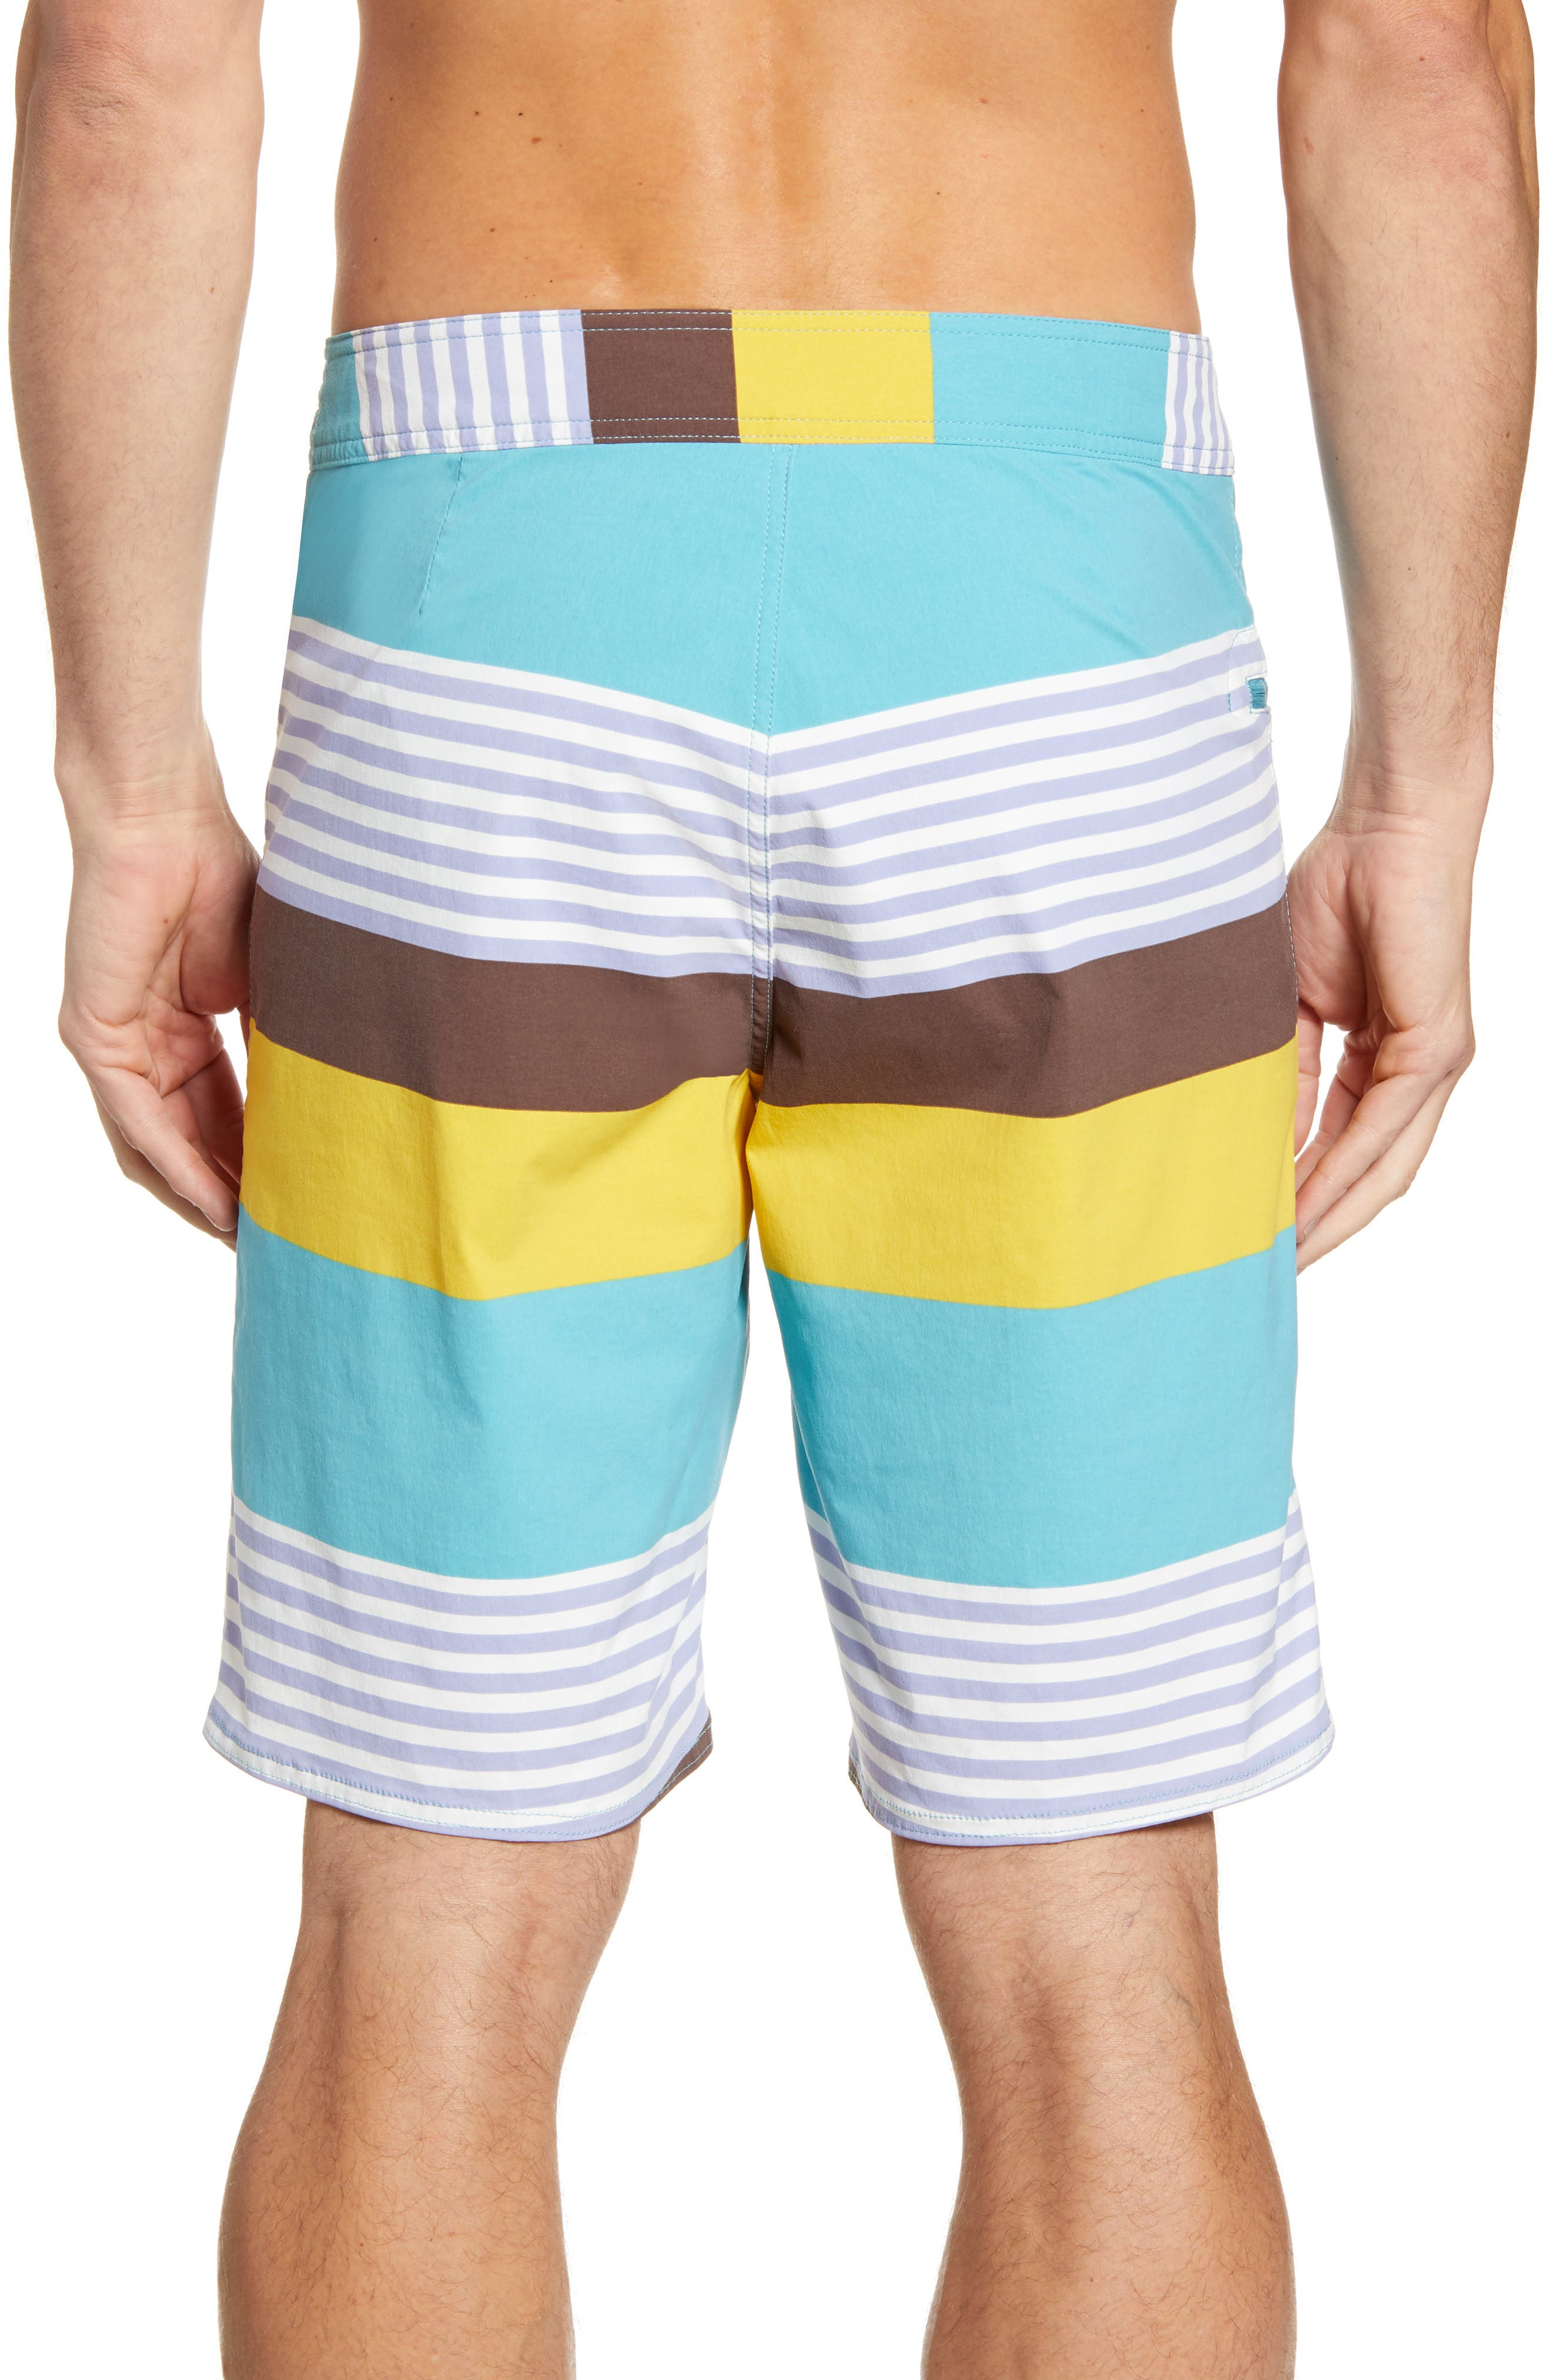 e54eab4862 Men's Patagonia Swimwear, Boardshorts & Swim Trunks | Nordstrom